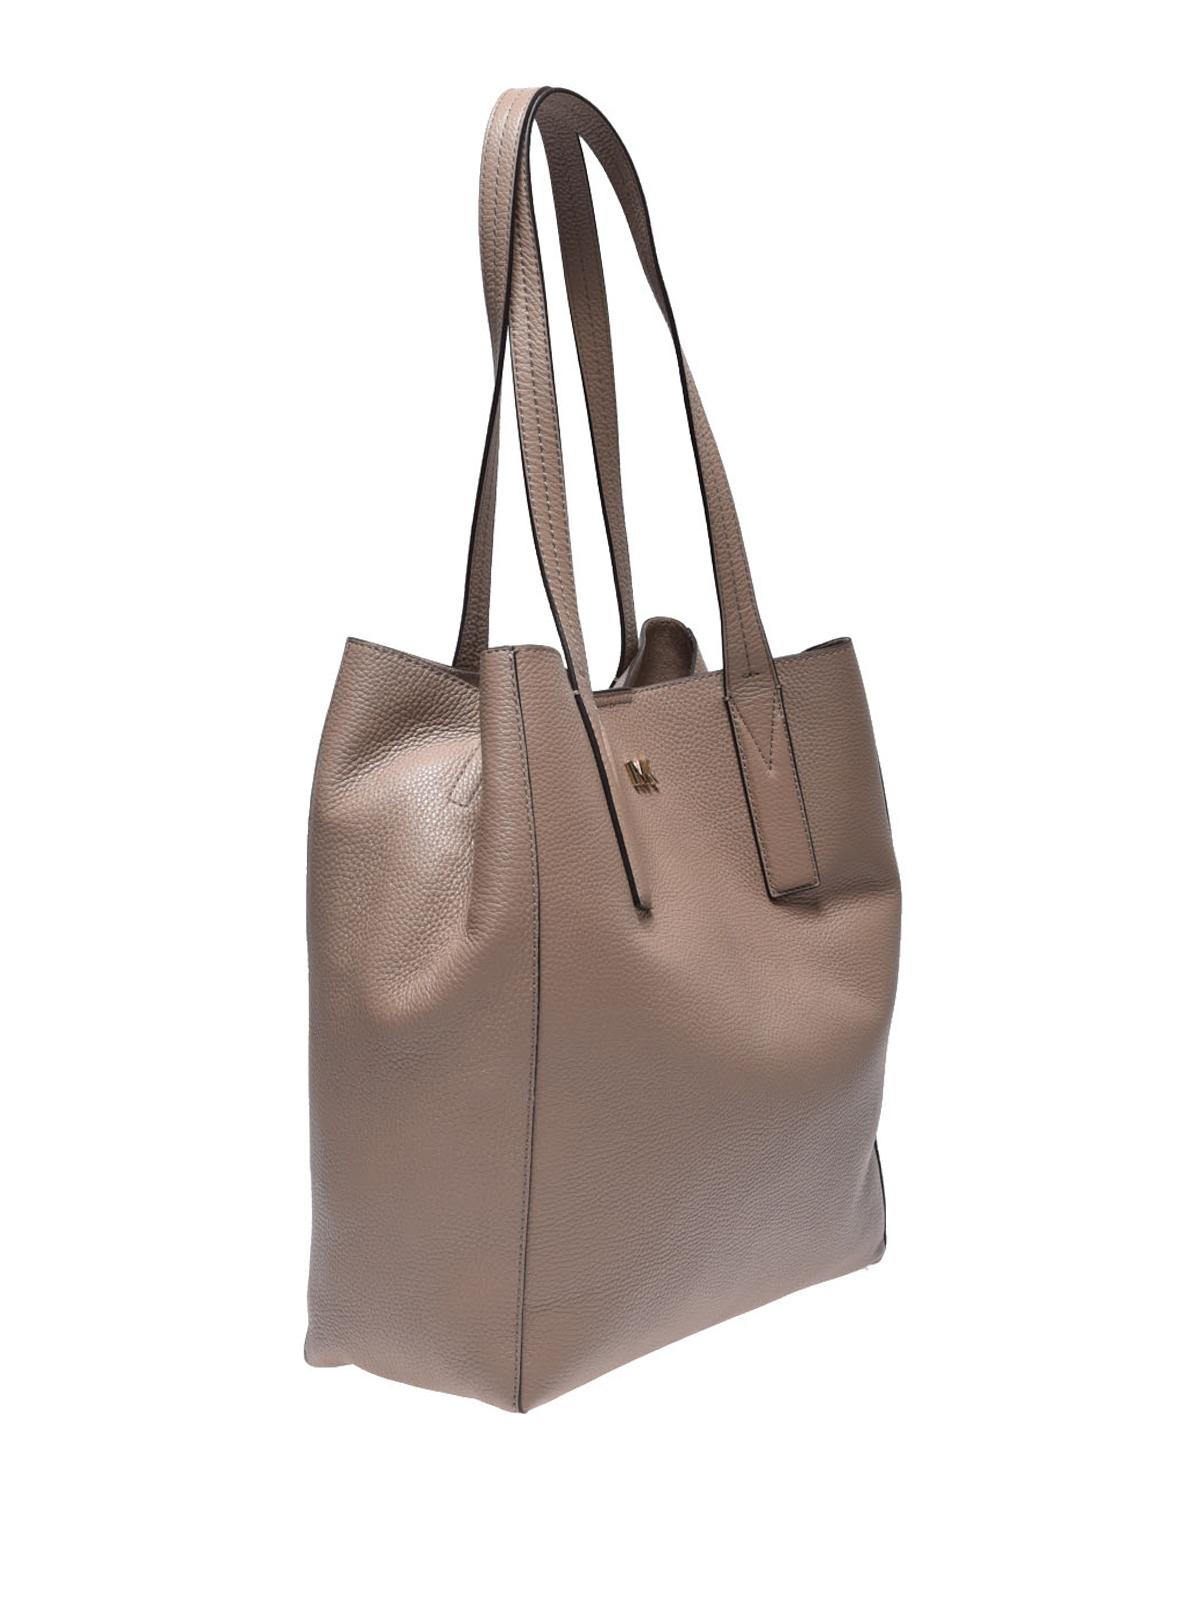 ed9726f5c27c Michael Kors - Junie large tote - totes bags - 30T8TX5T3L 208 ...